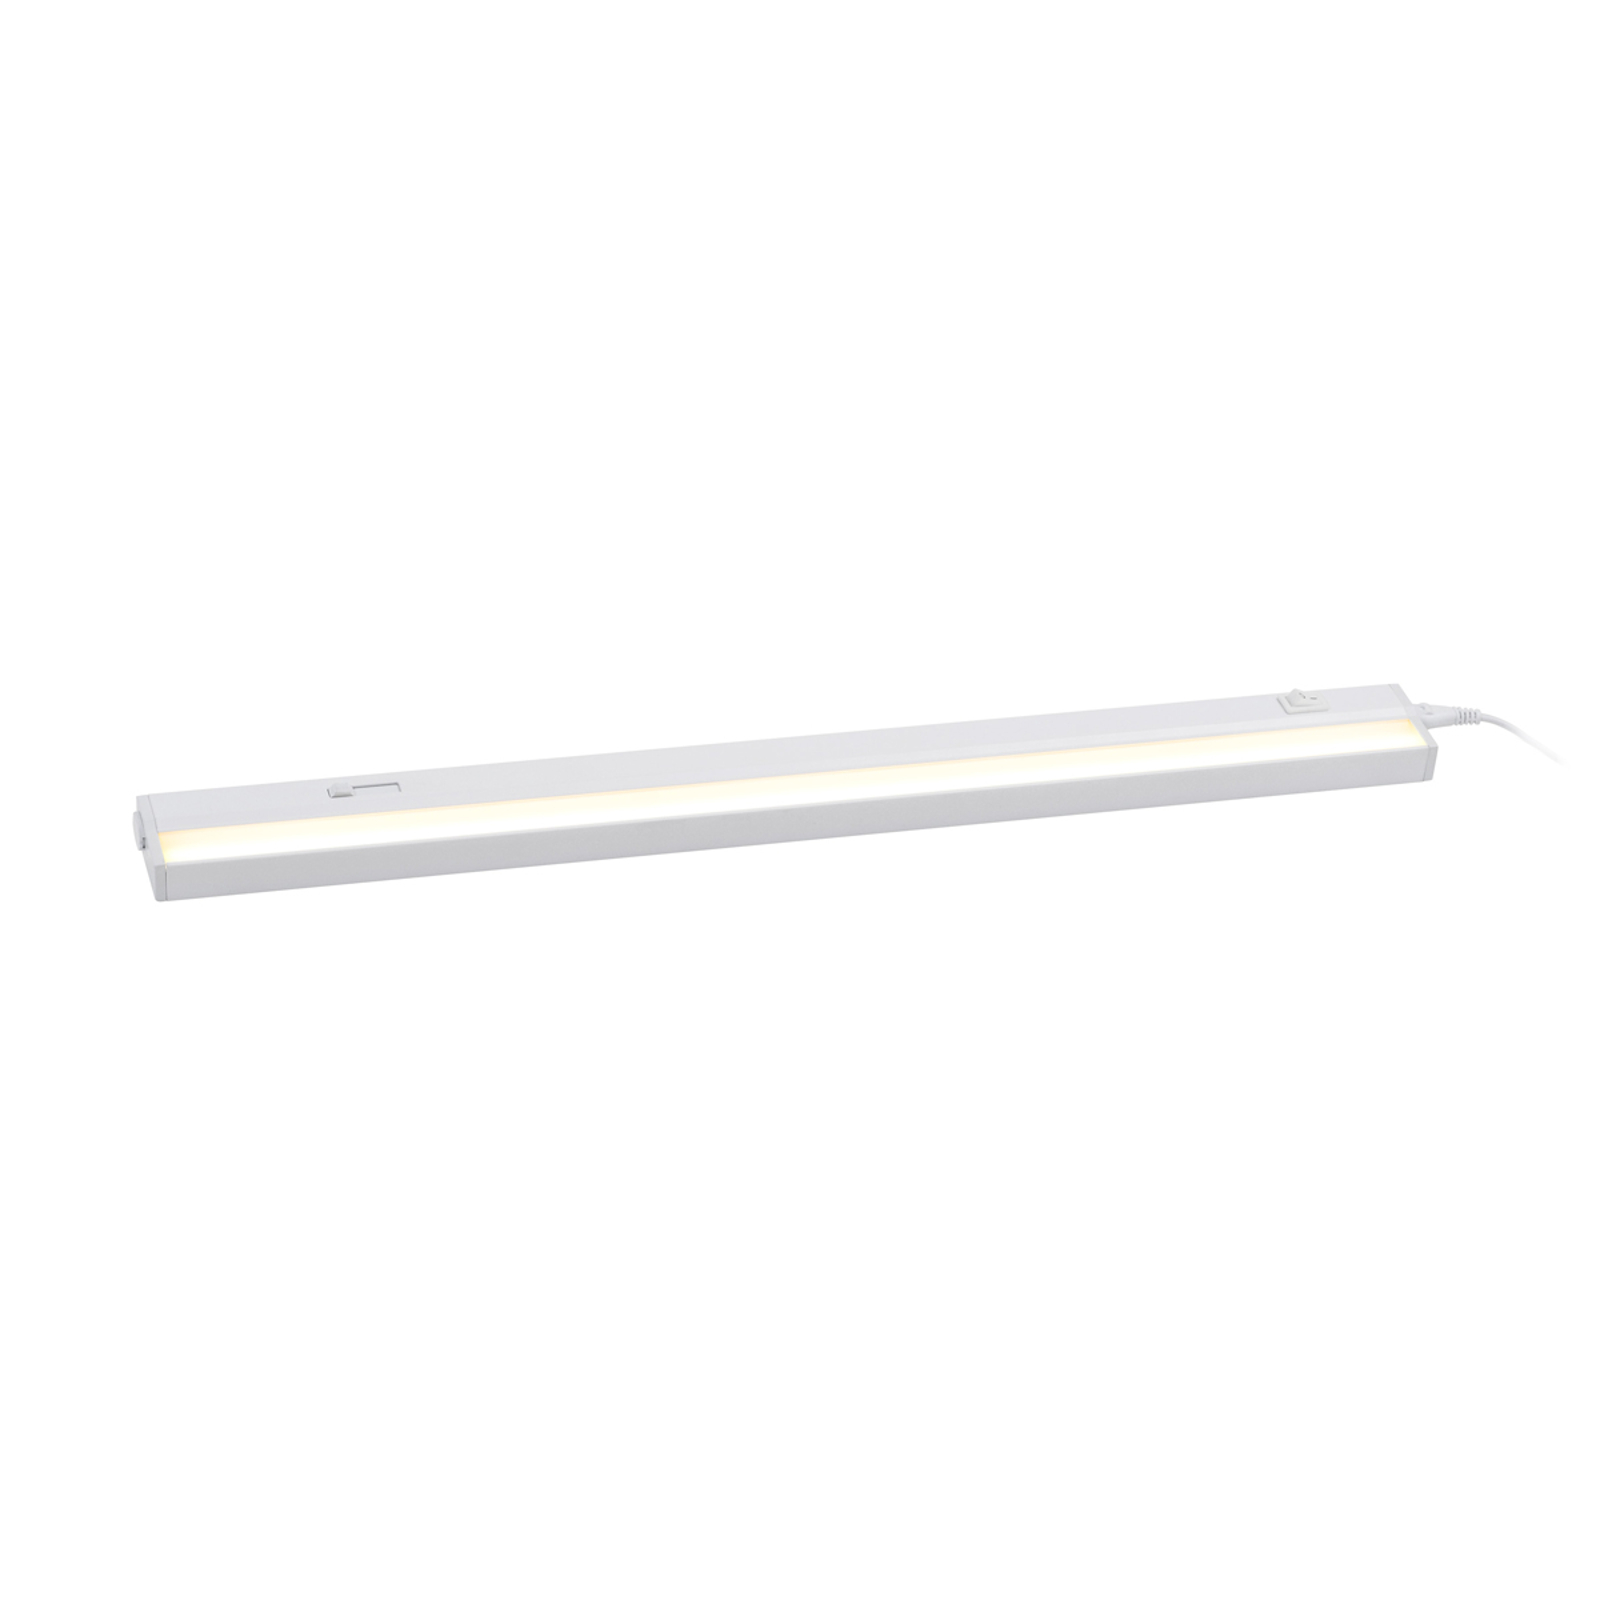 LED-Unterschranklampe Cabinet light  Länge 42,4 cm